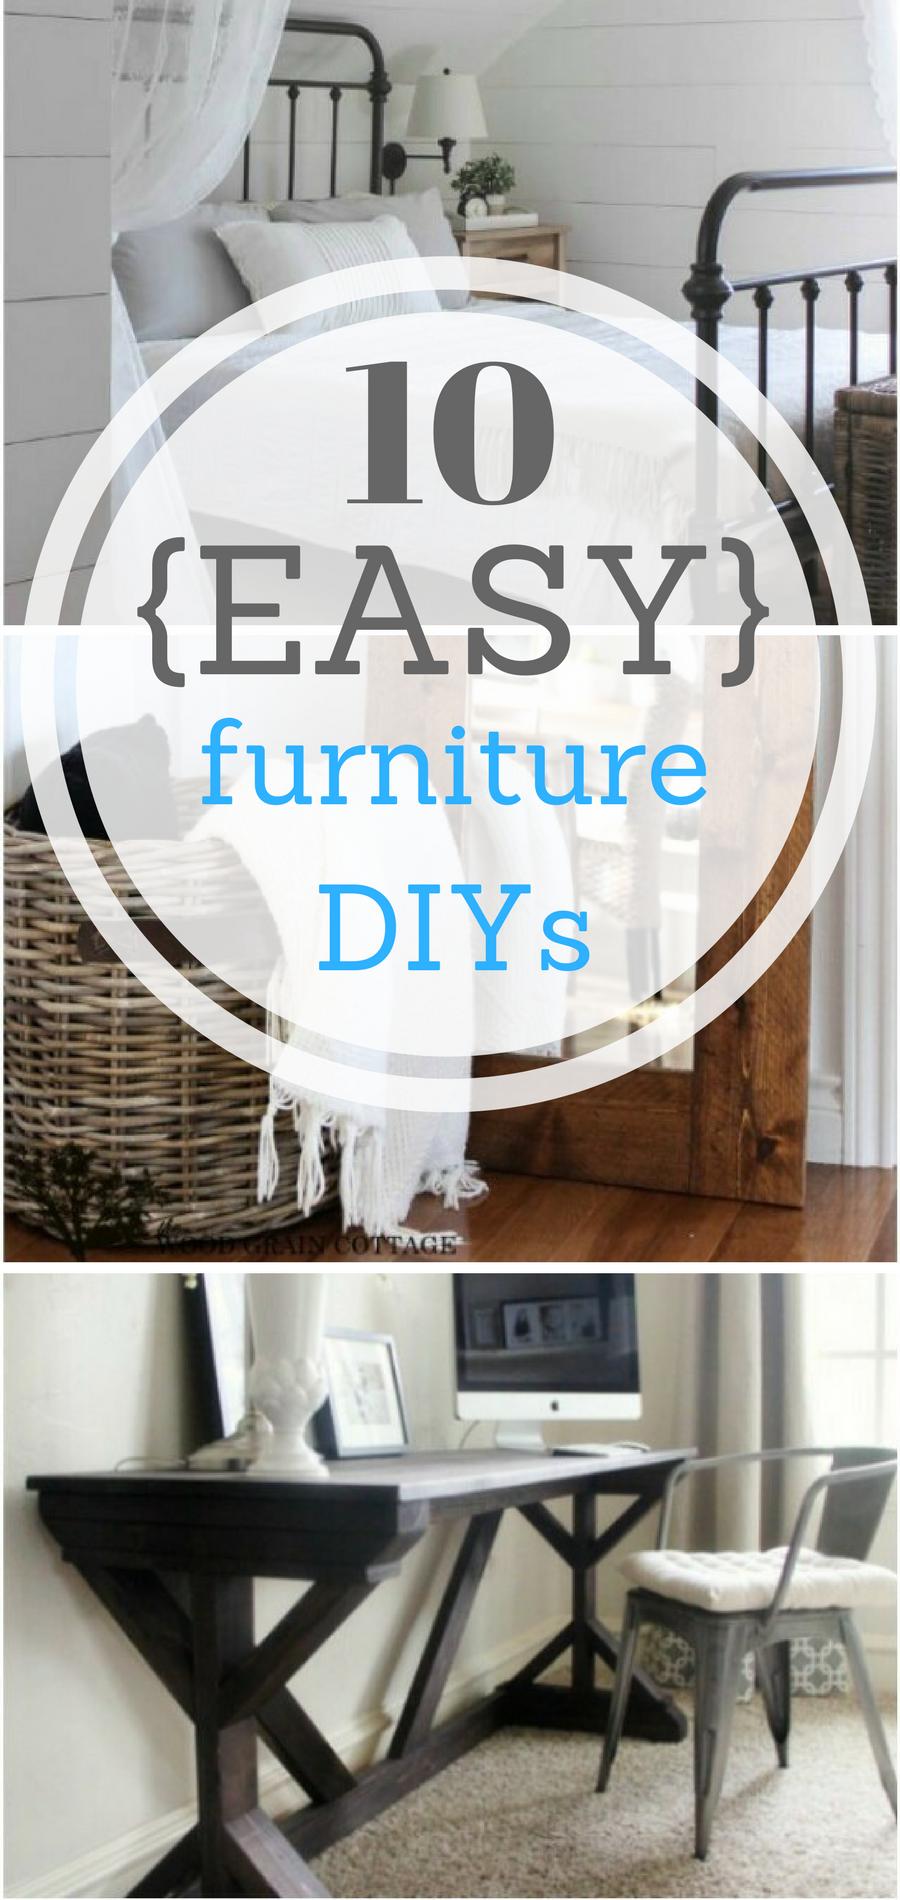 compatible furniture. 10 {EASY} Furniture DIYs Compatible F